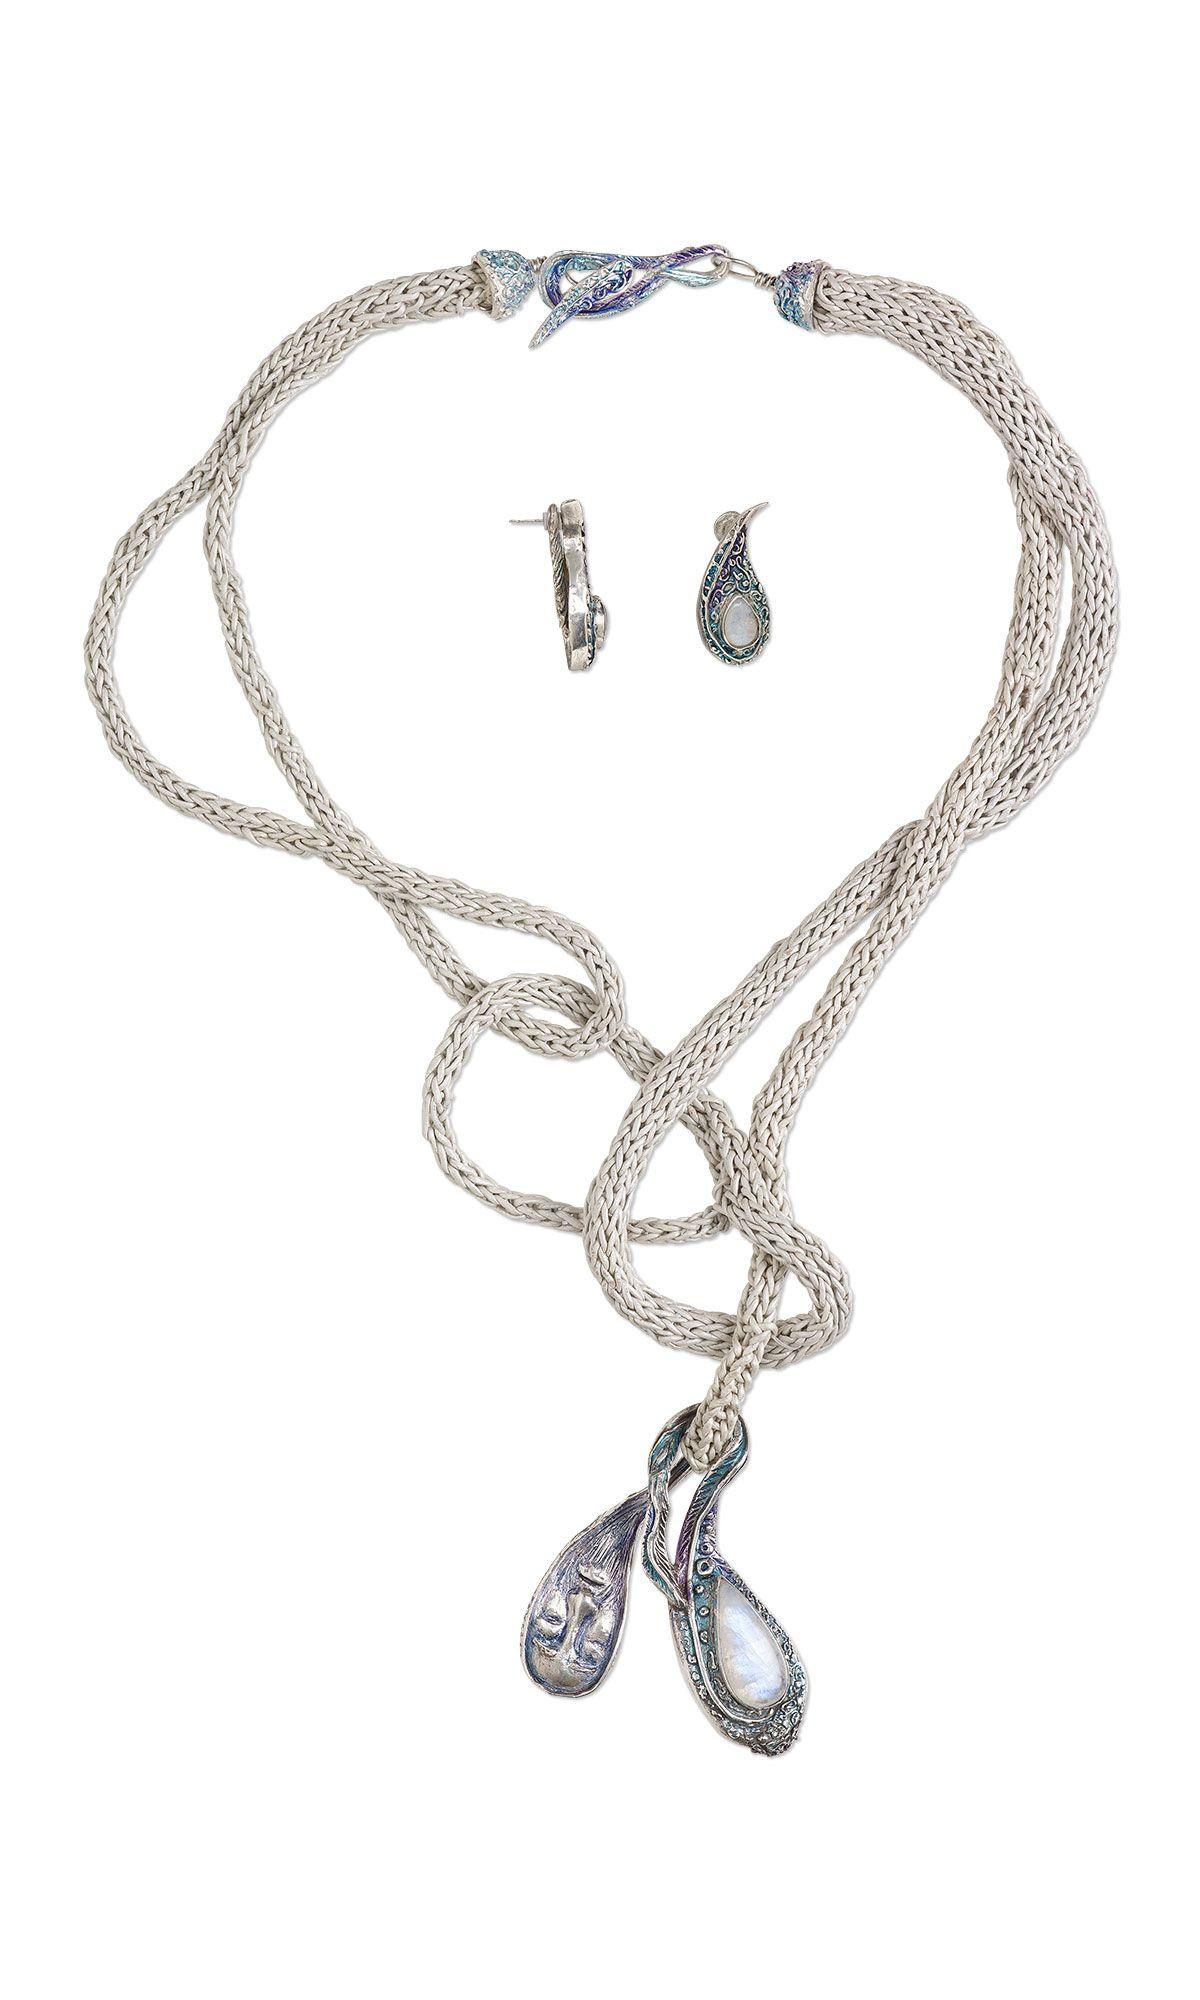 Dejando atras ''Leaving behind'' by Designer Rosa Elena Rivera -  Fire Mountain Gems and Beads' Contest 2016 featuring Metal -  Finalist  #beadingcontest #jewelrydesign #beading #metalsmith #diyjewelry #jewelrymakingcontest